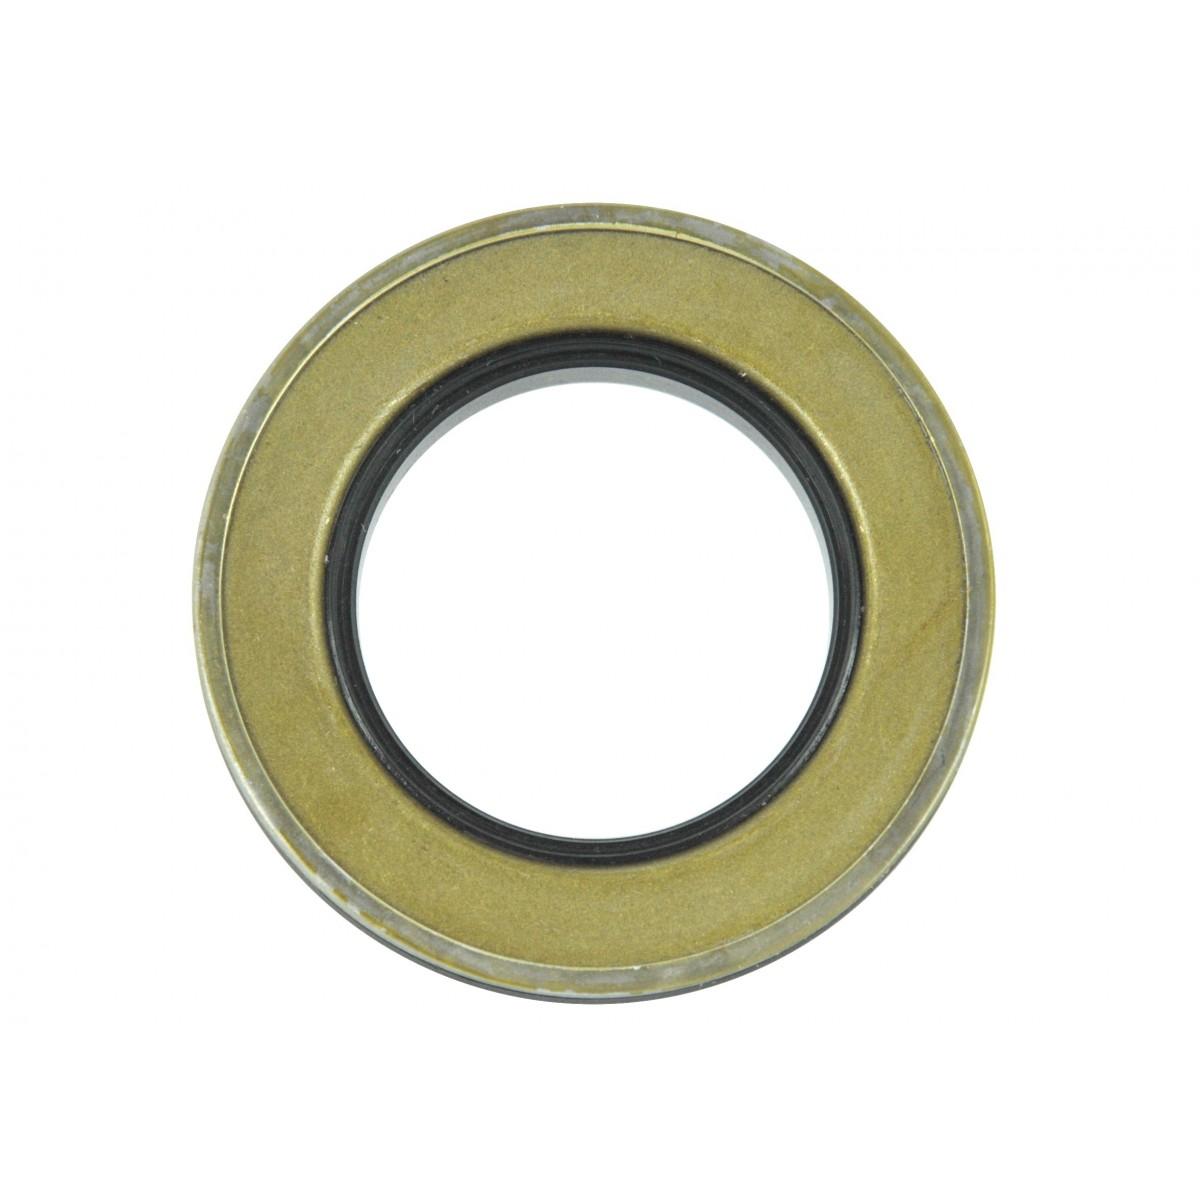 Cartridge oil seal 45 x 75 x 14/16 mm on the front axle Kubota M5000, M6040, BQ3164E